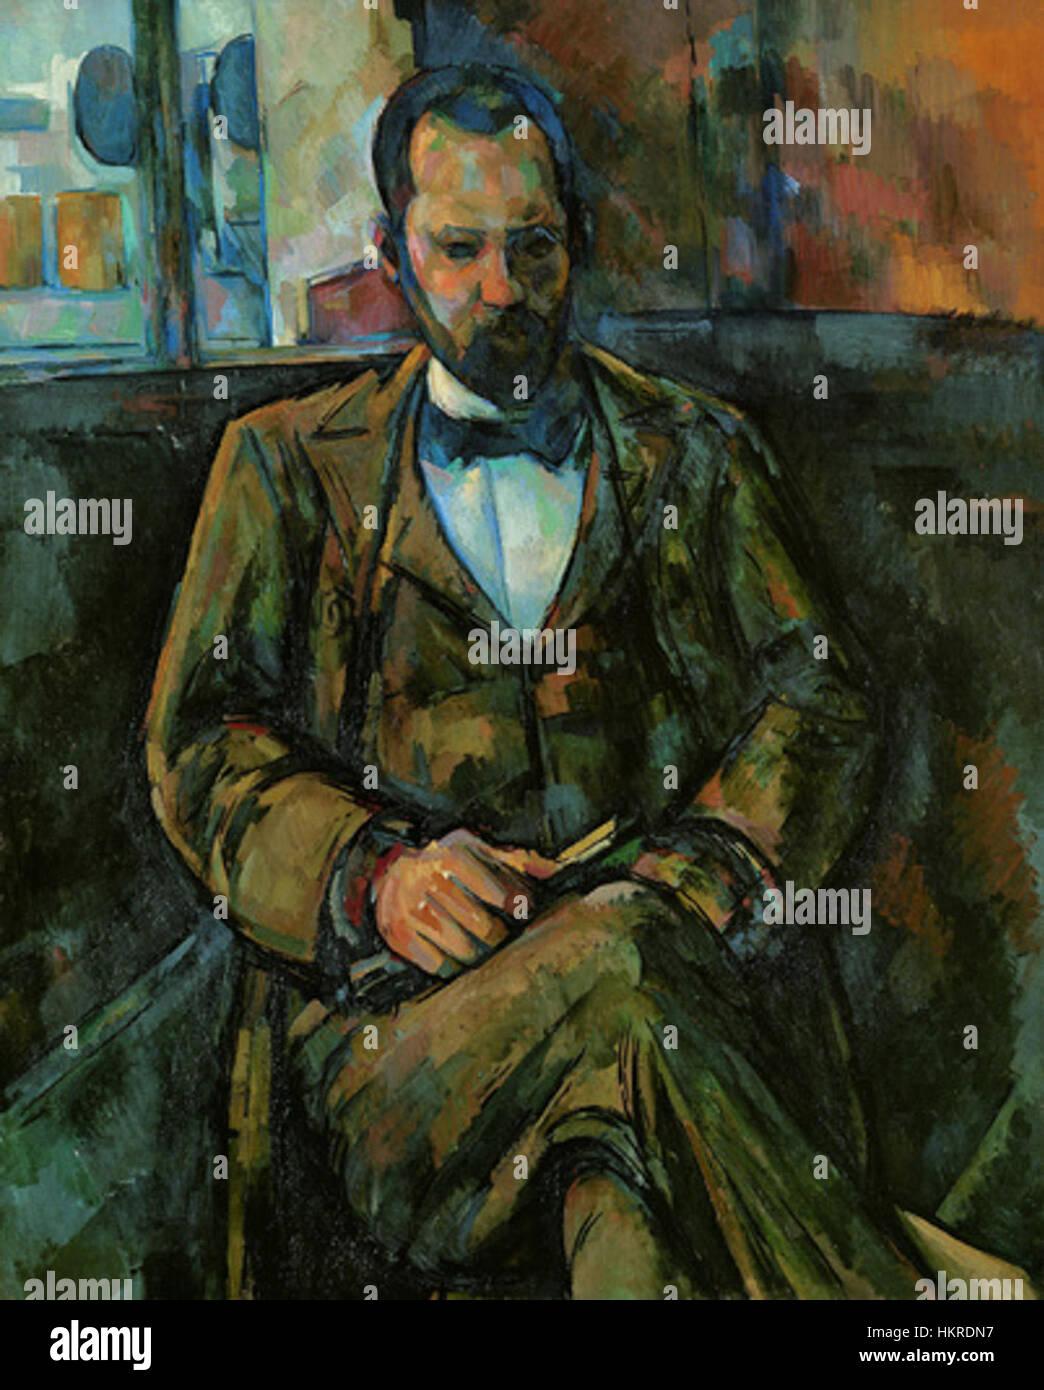 Cezanne Ambroise Vollard - Stock Image